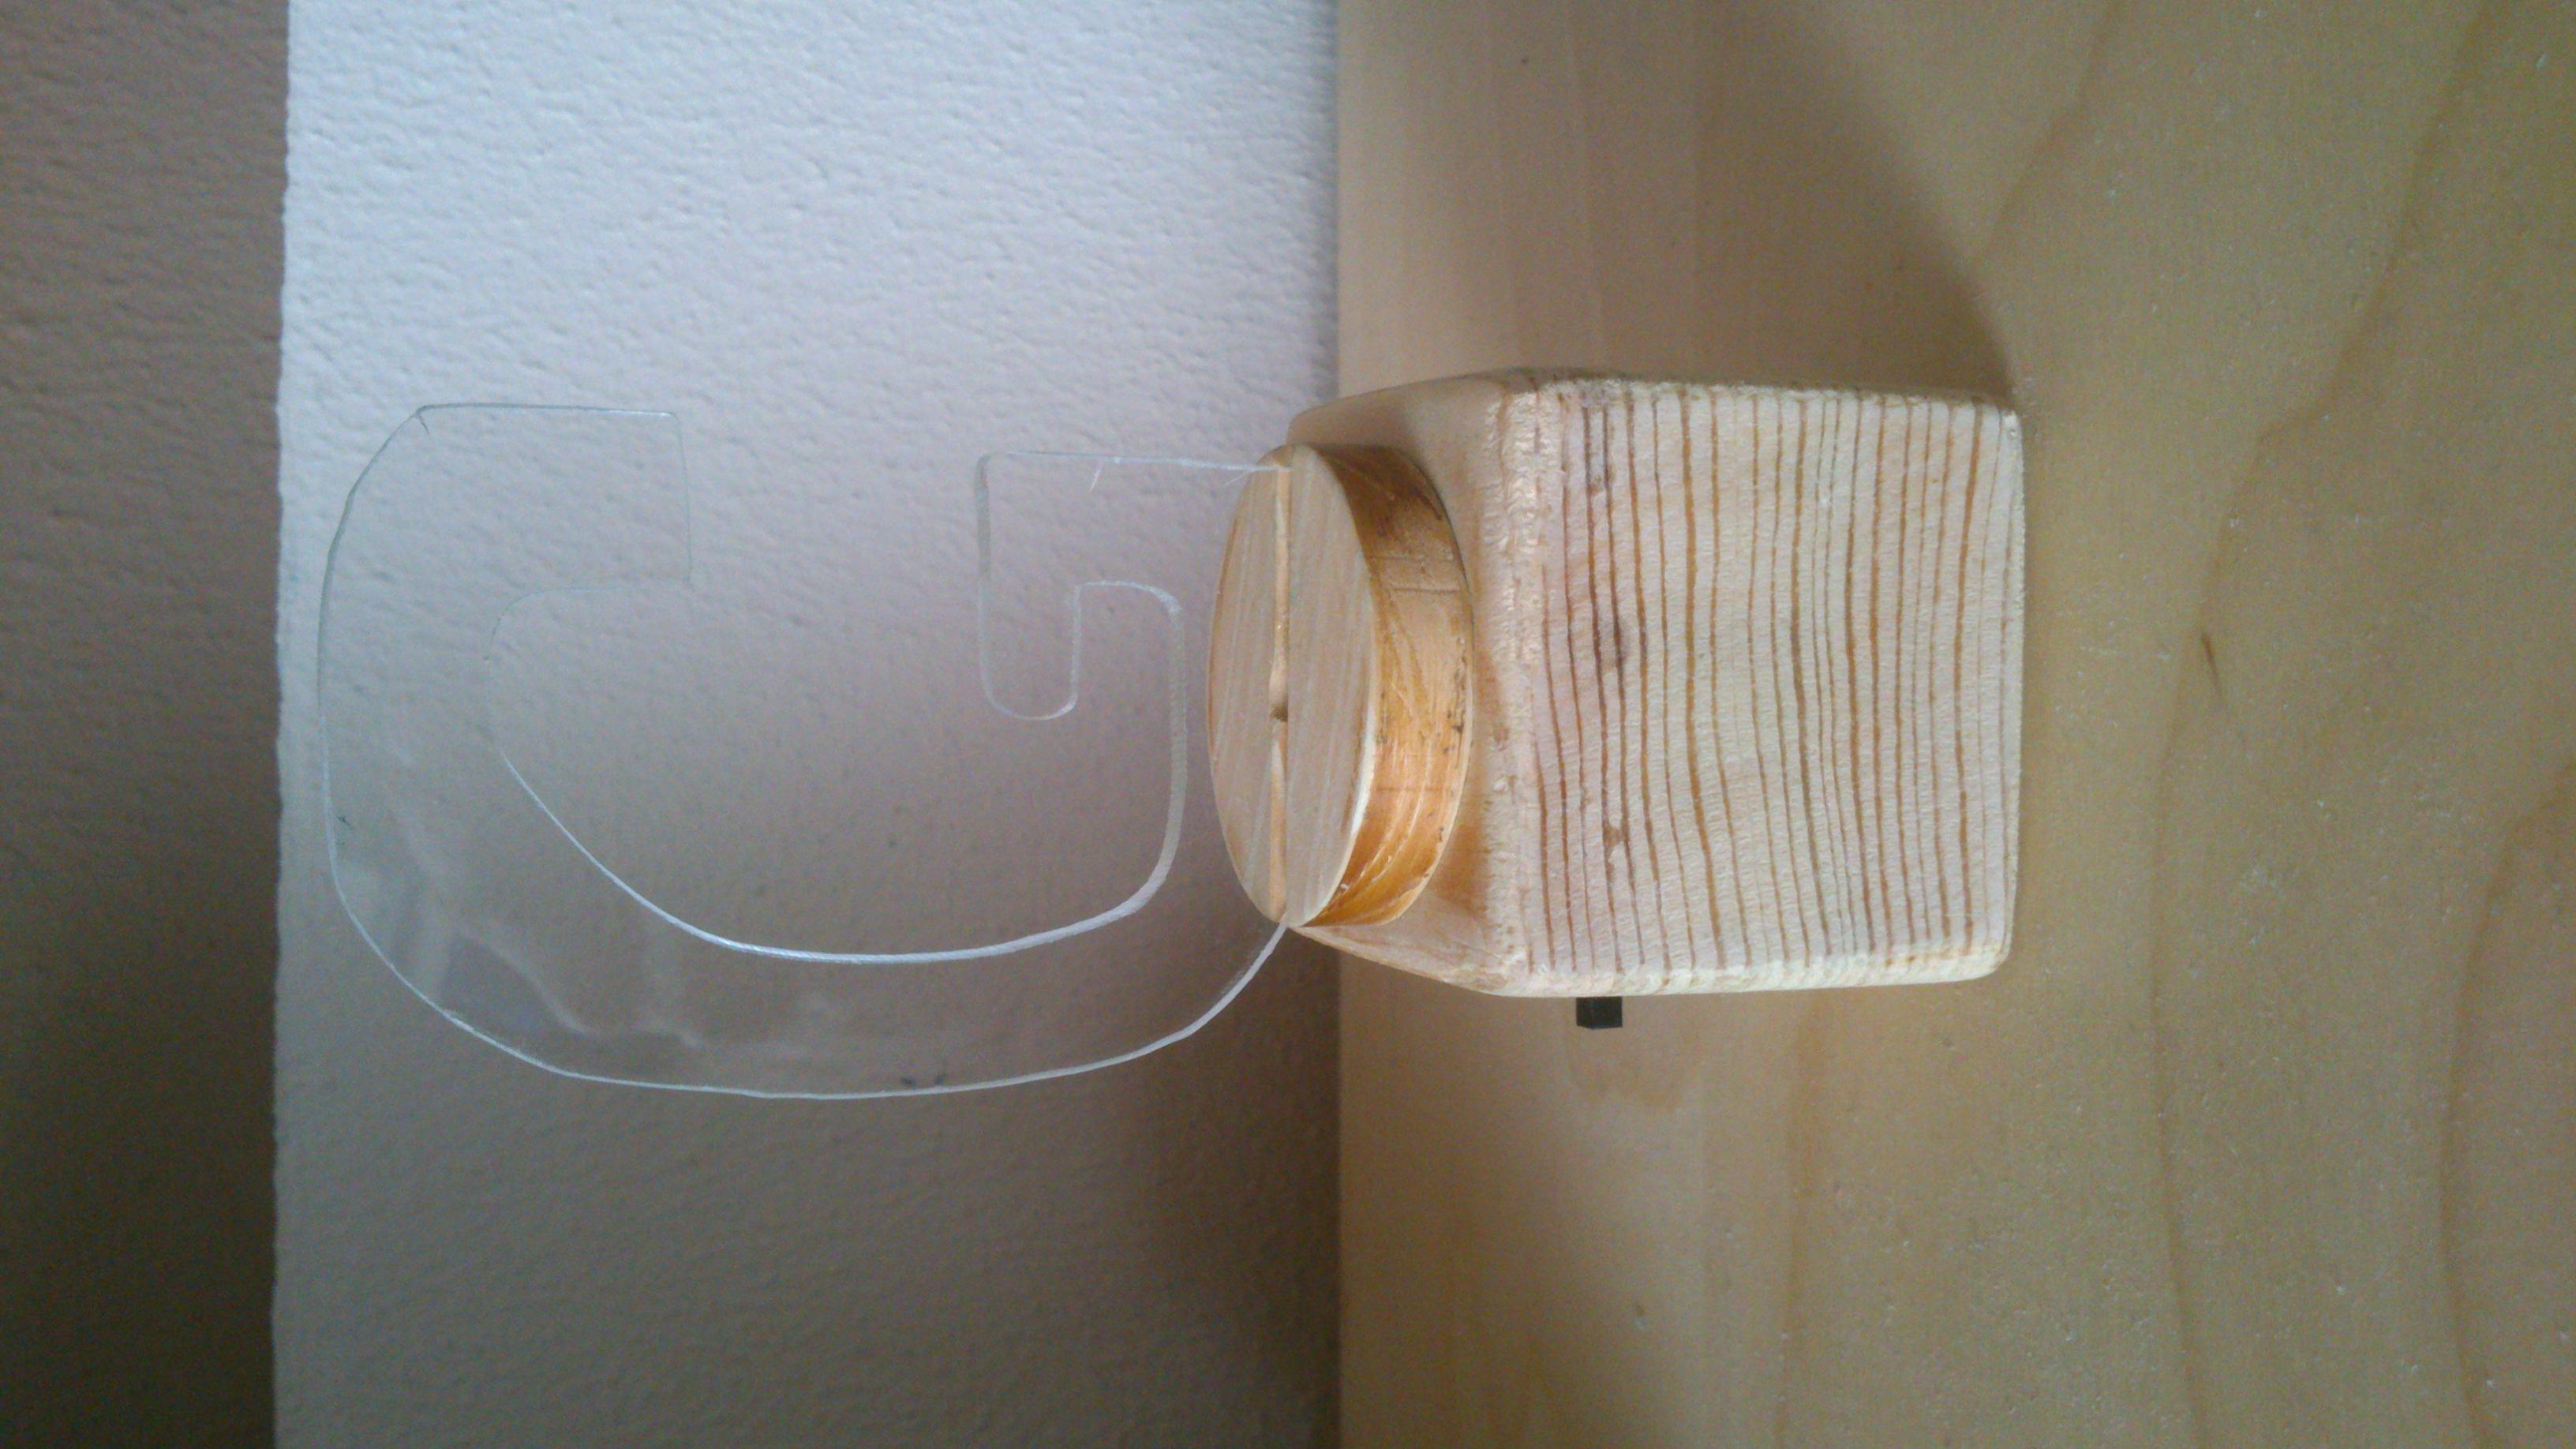 led lampen selbst bauen diy beleuchtung neu erfunden u2013 aquagrow. Black Bedroom Furniture Sets. Home Design Ideas